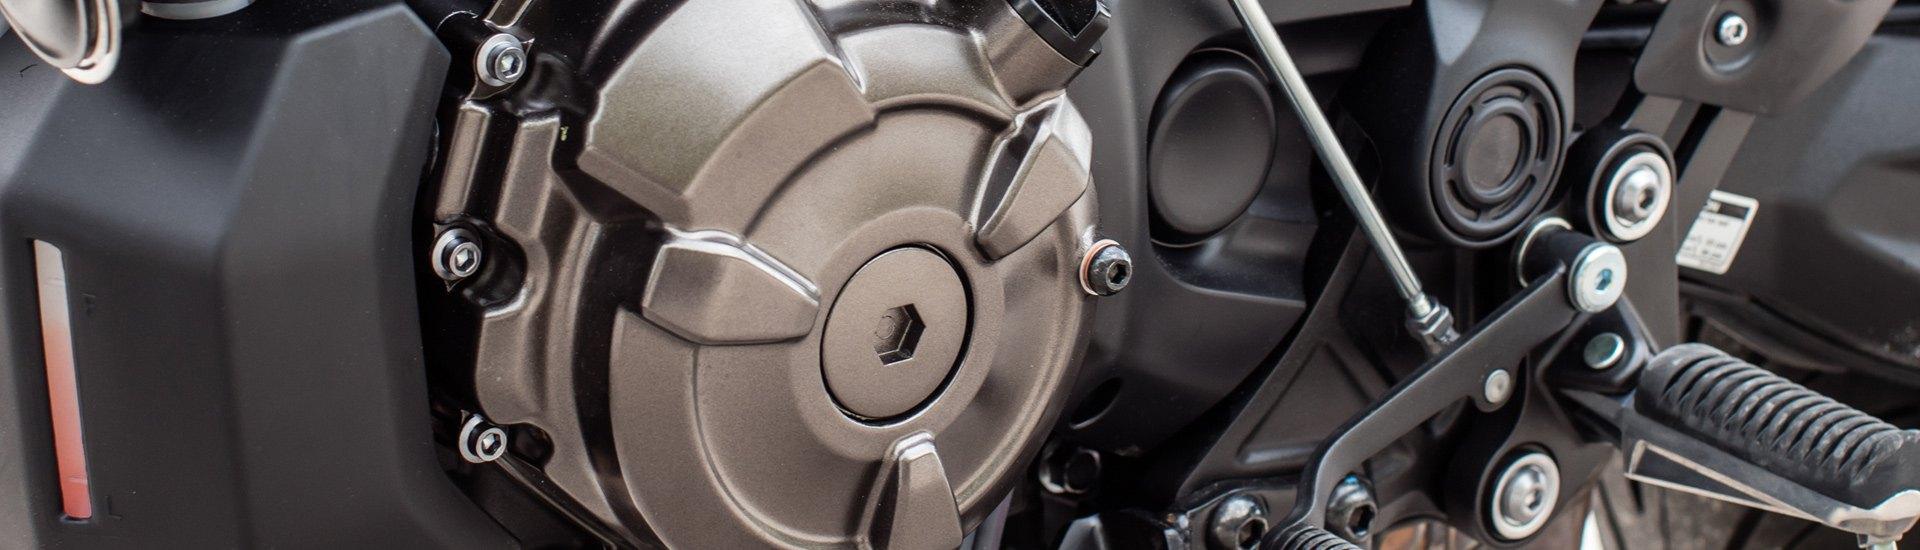 Kawasaki Sport/Street Bike Engine Parts | Pistons, Camshafts